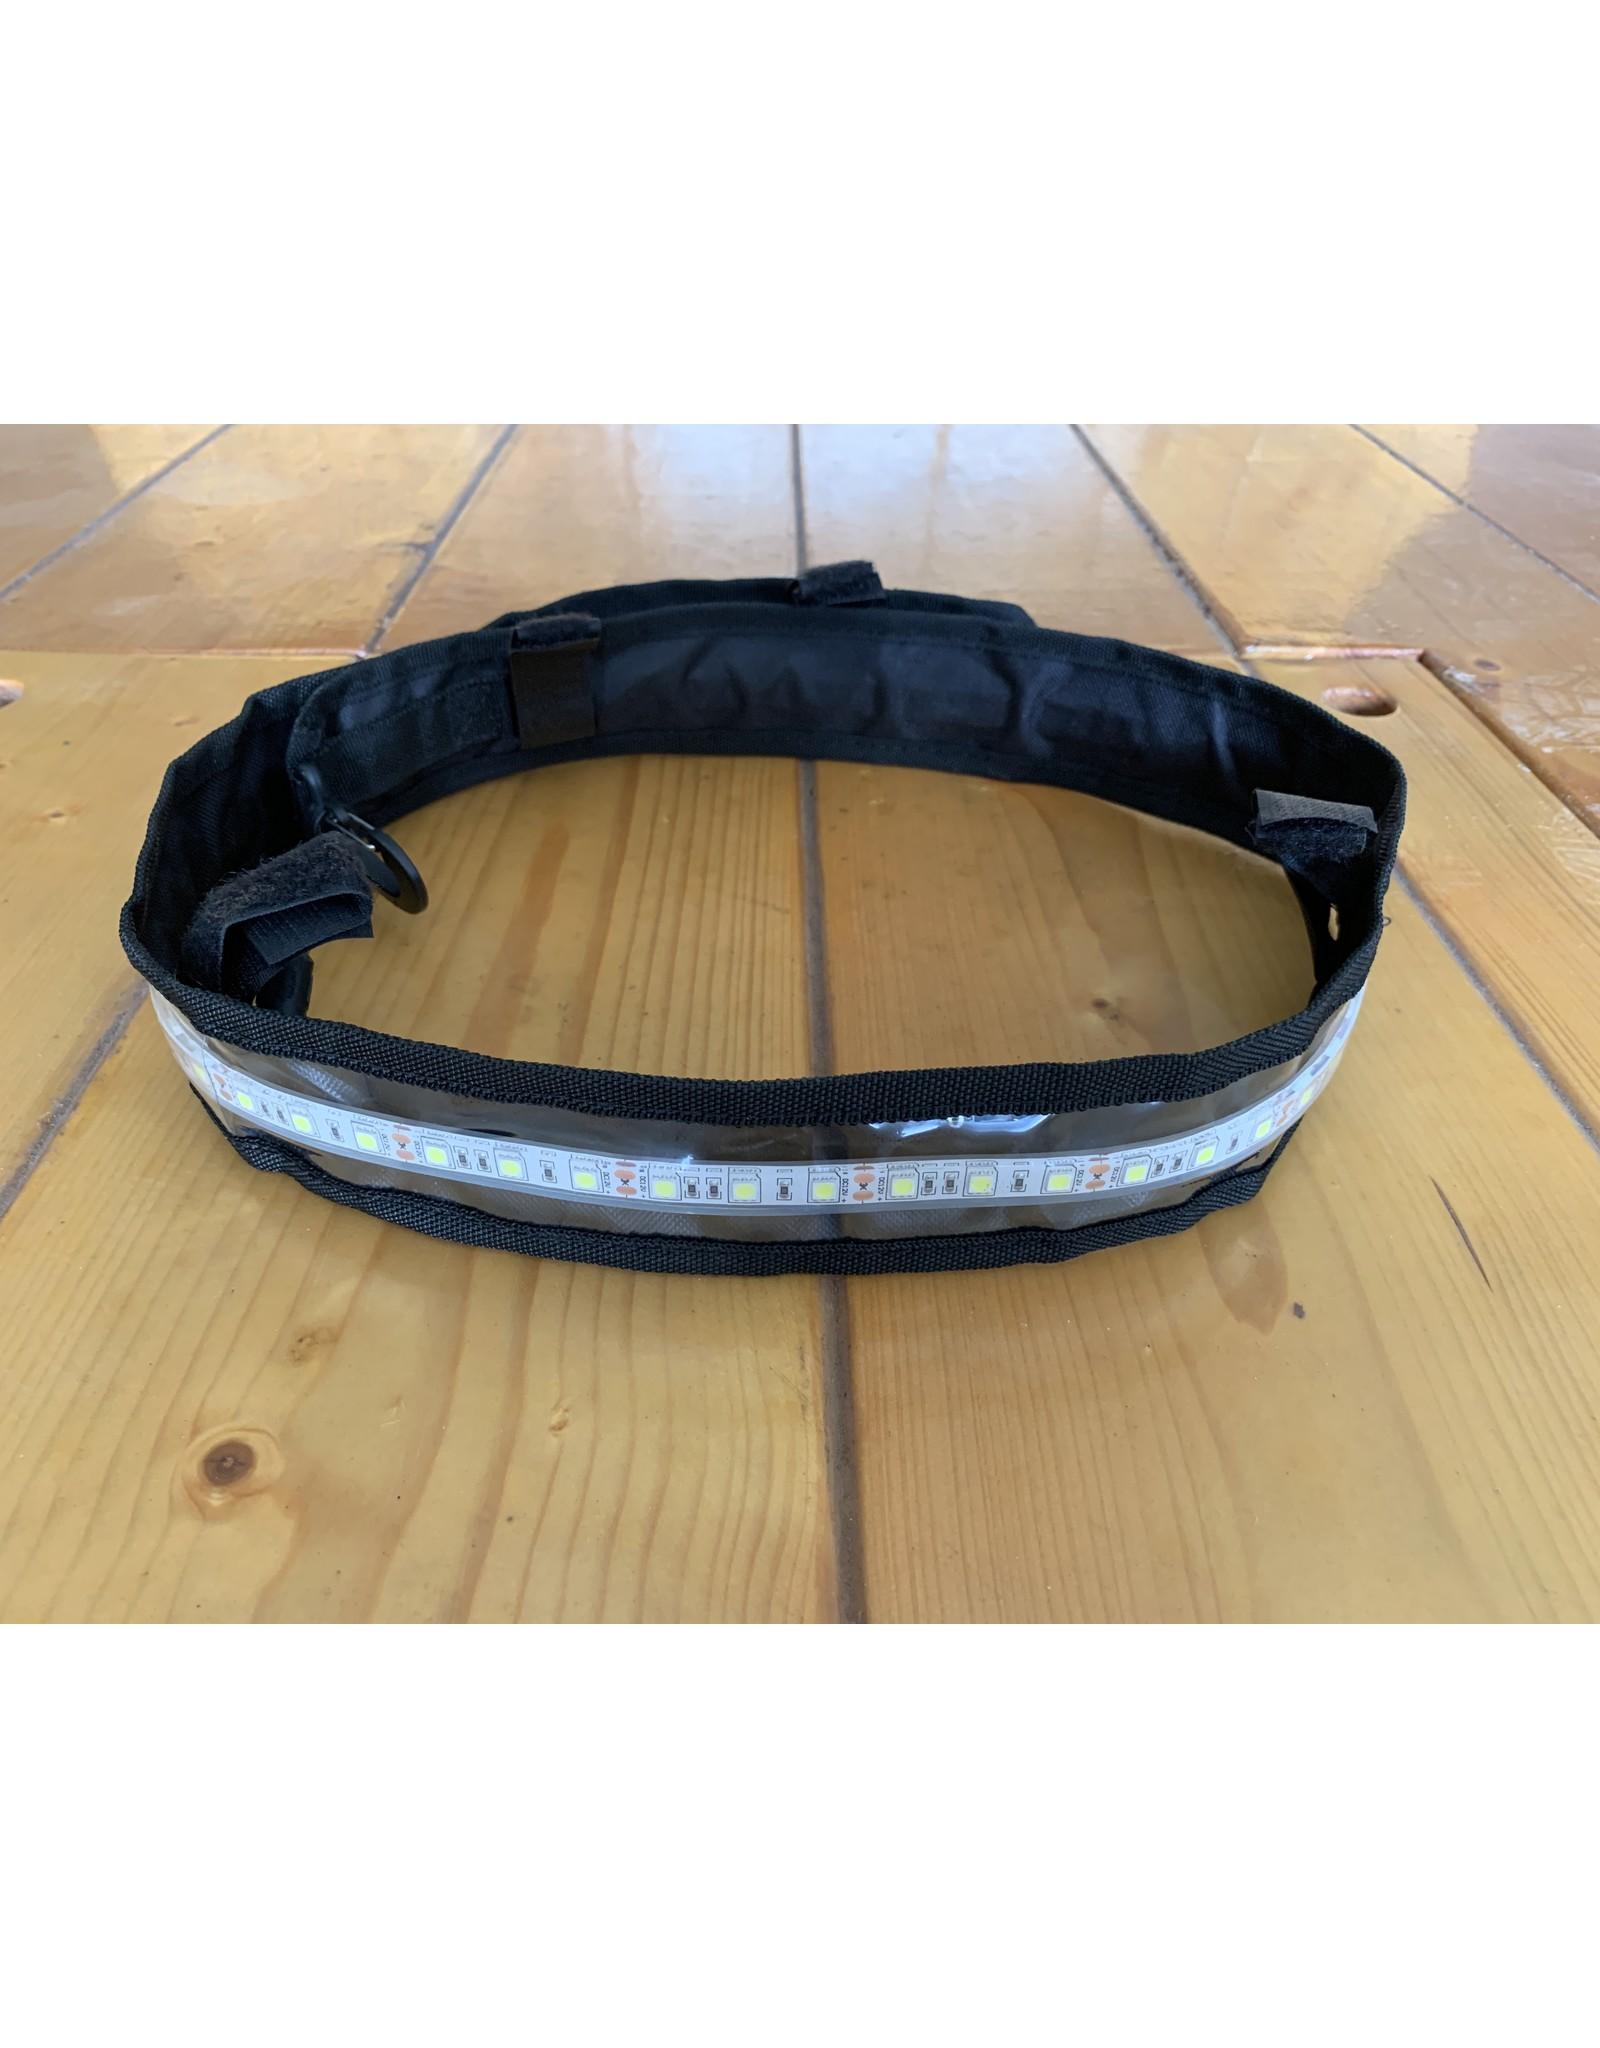 KOALA CREEK LED-Strip Dachzelt / Markise / Zelt